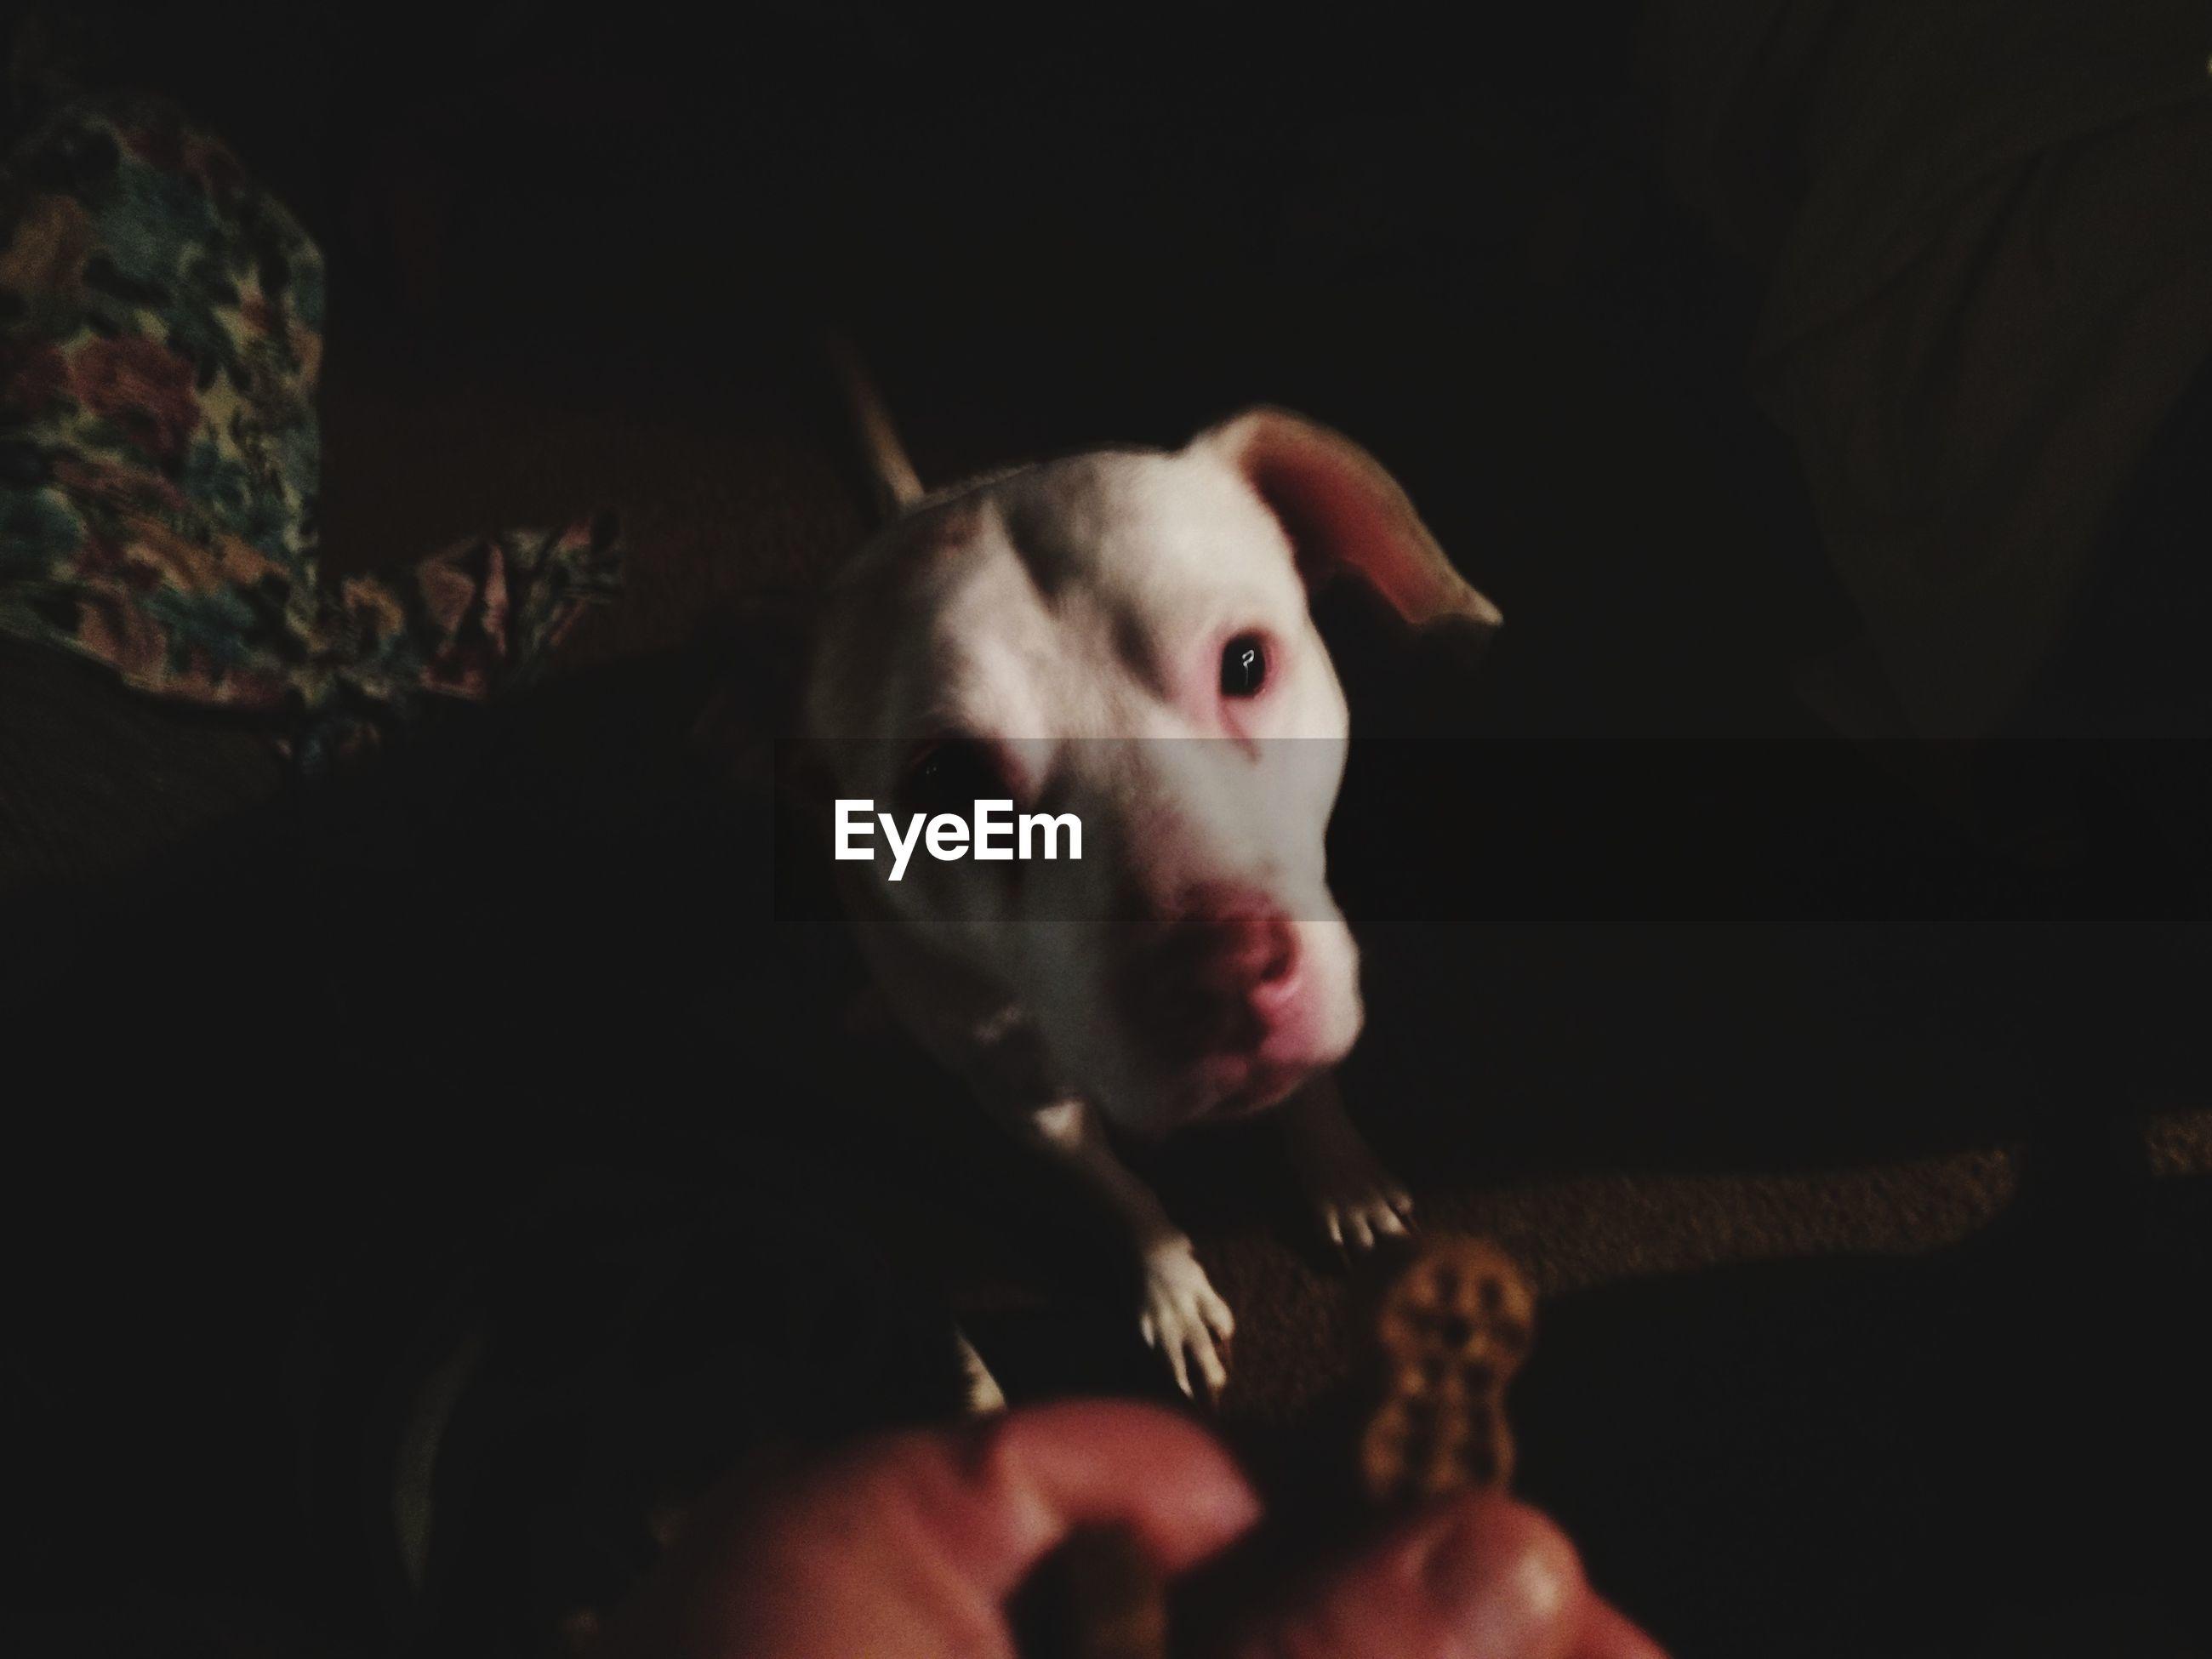 CLOSE-UP PORTRAIT OF DOG IN DARK